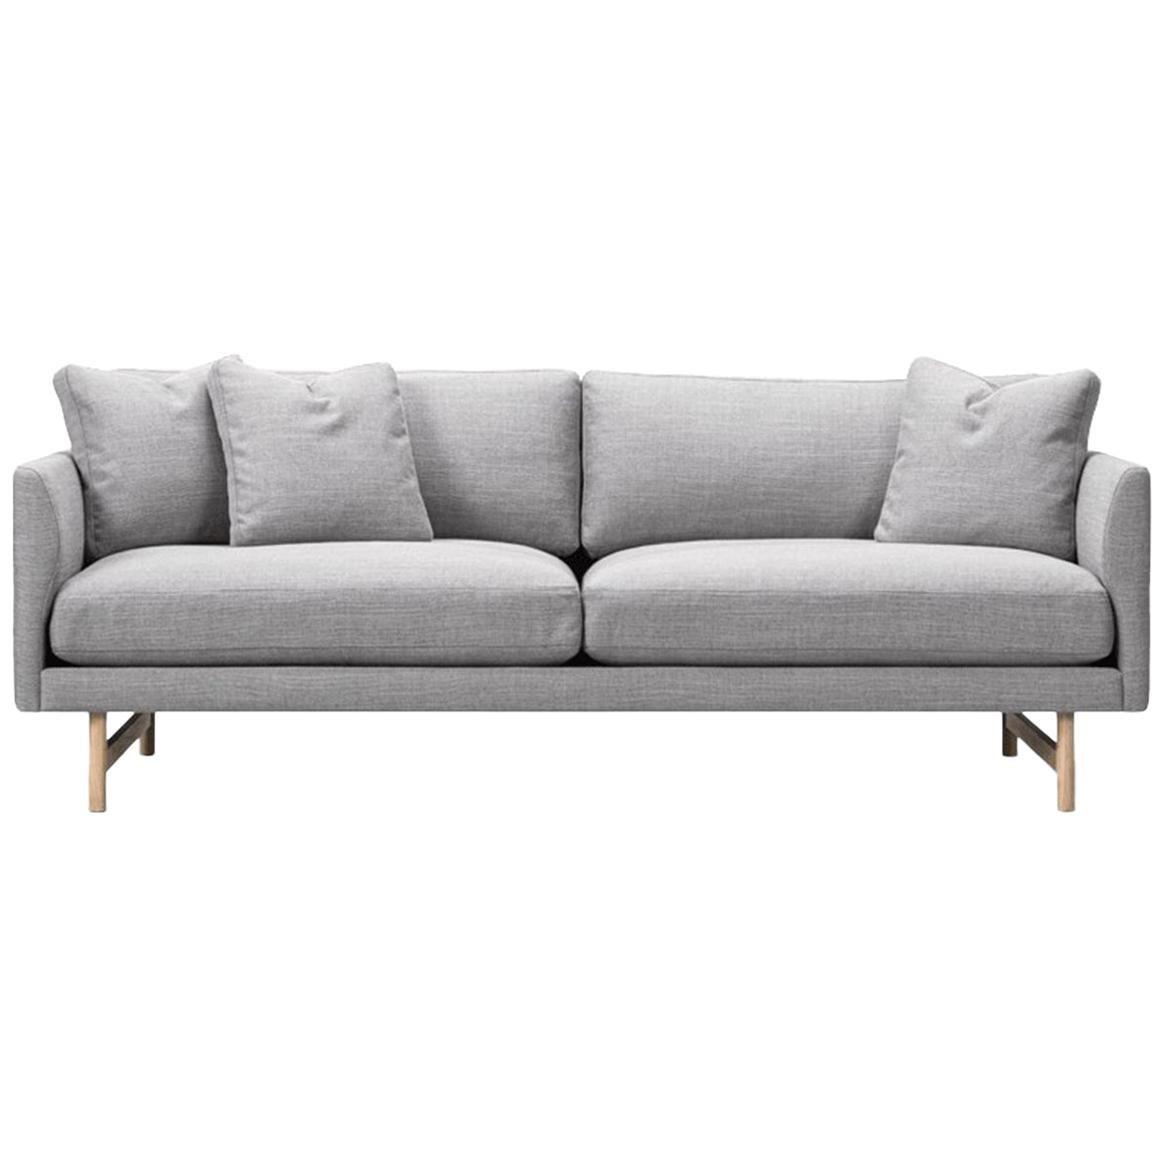 Hugo Passos Calmo Sofa 95, 2-Seater, Wood Base